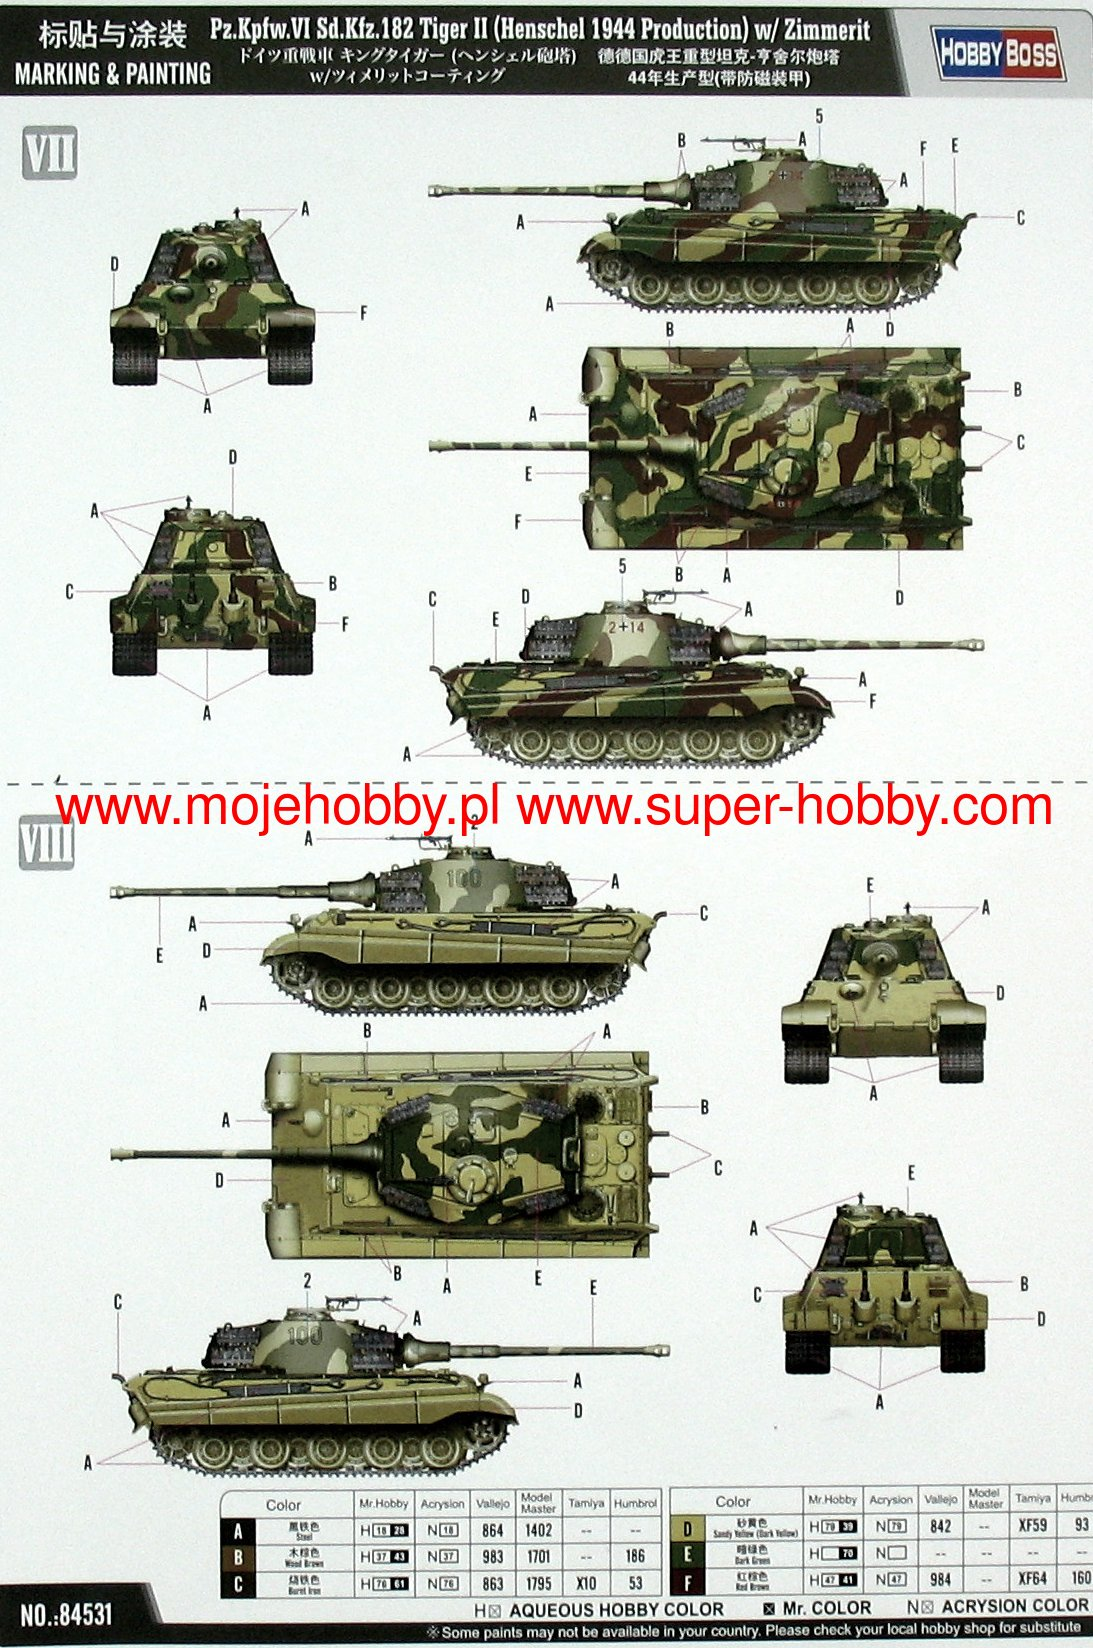 HOBBY BOSS 84531 1//35 Pz.Kpfw.VI Sd.Kfz.182 Tiger II Henschel 1944 Production